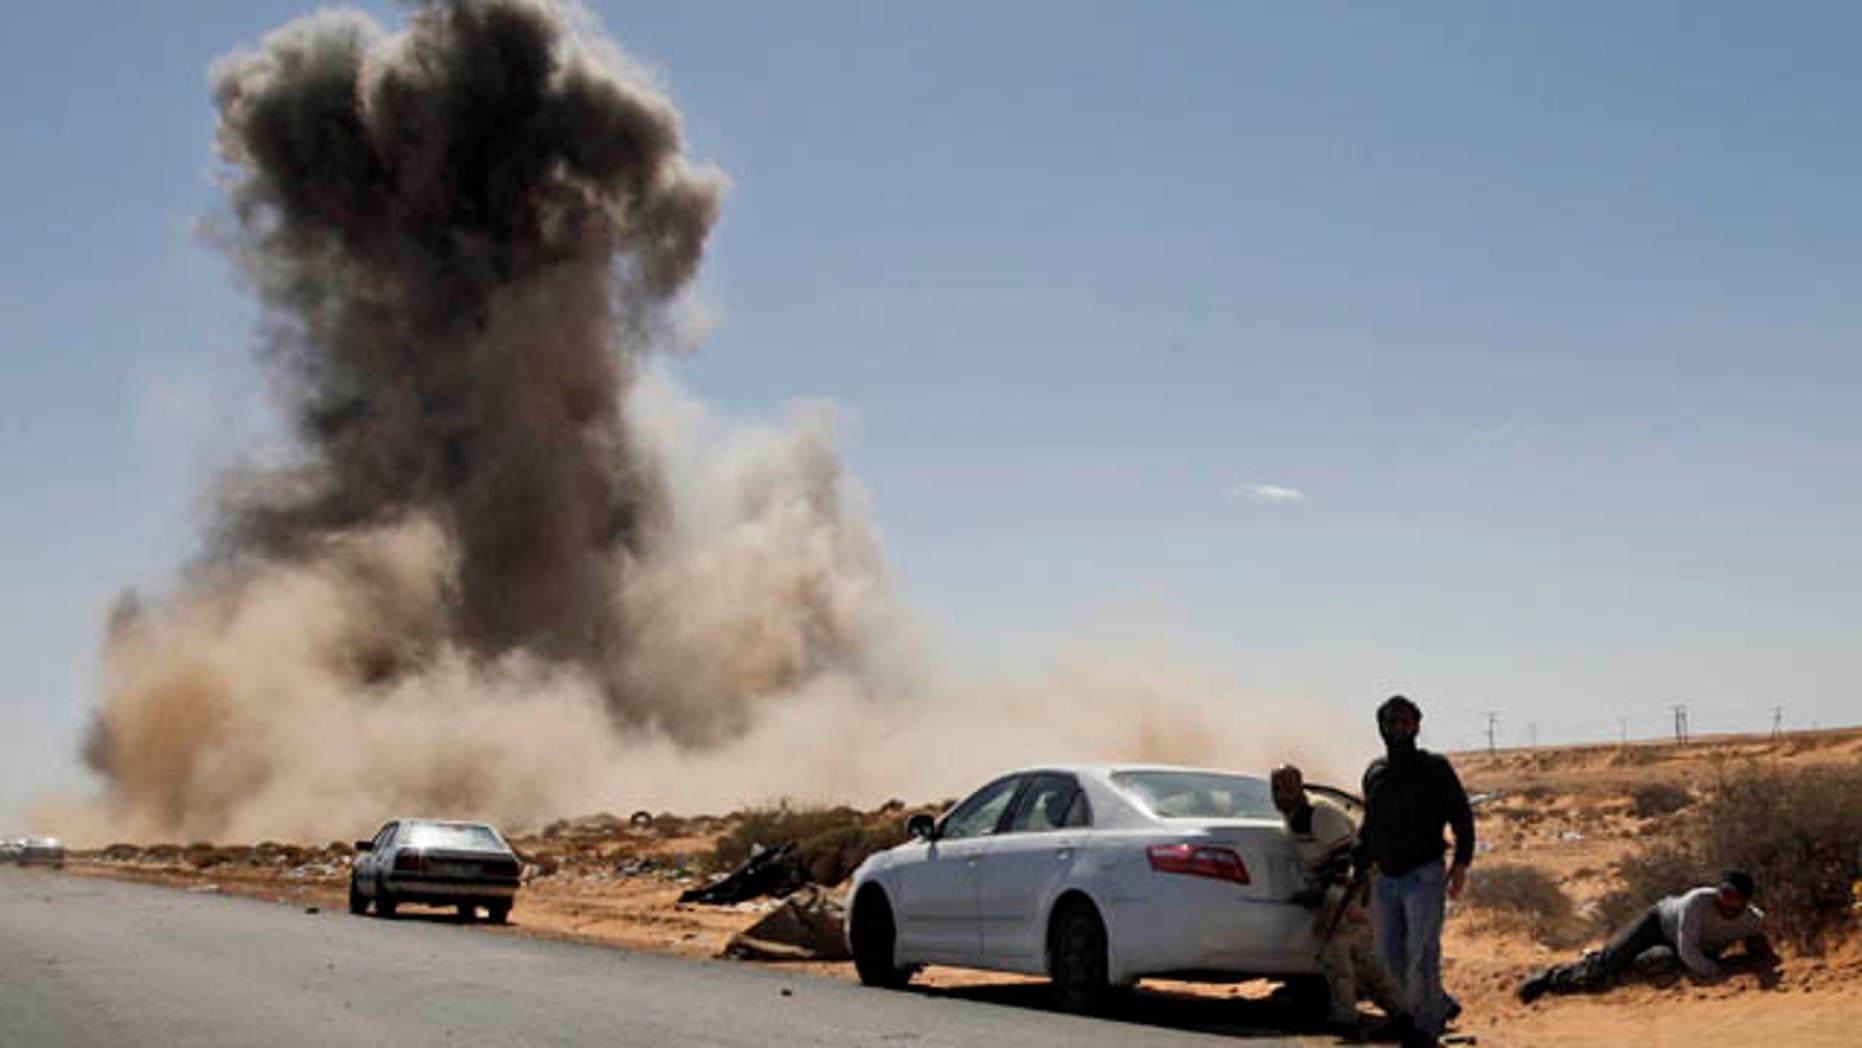 March 7: Smoke raises following an airstrike by Libyan warplanes near a checkpoint close to the anti-Libyan Leader Muammar al-Qaddafi rebels checkpoint in the oil town of Ras Lanouf, eastern Libya. (AP)